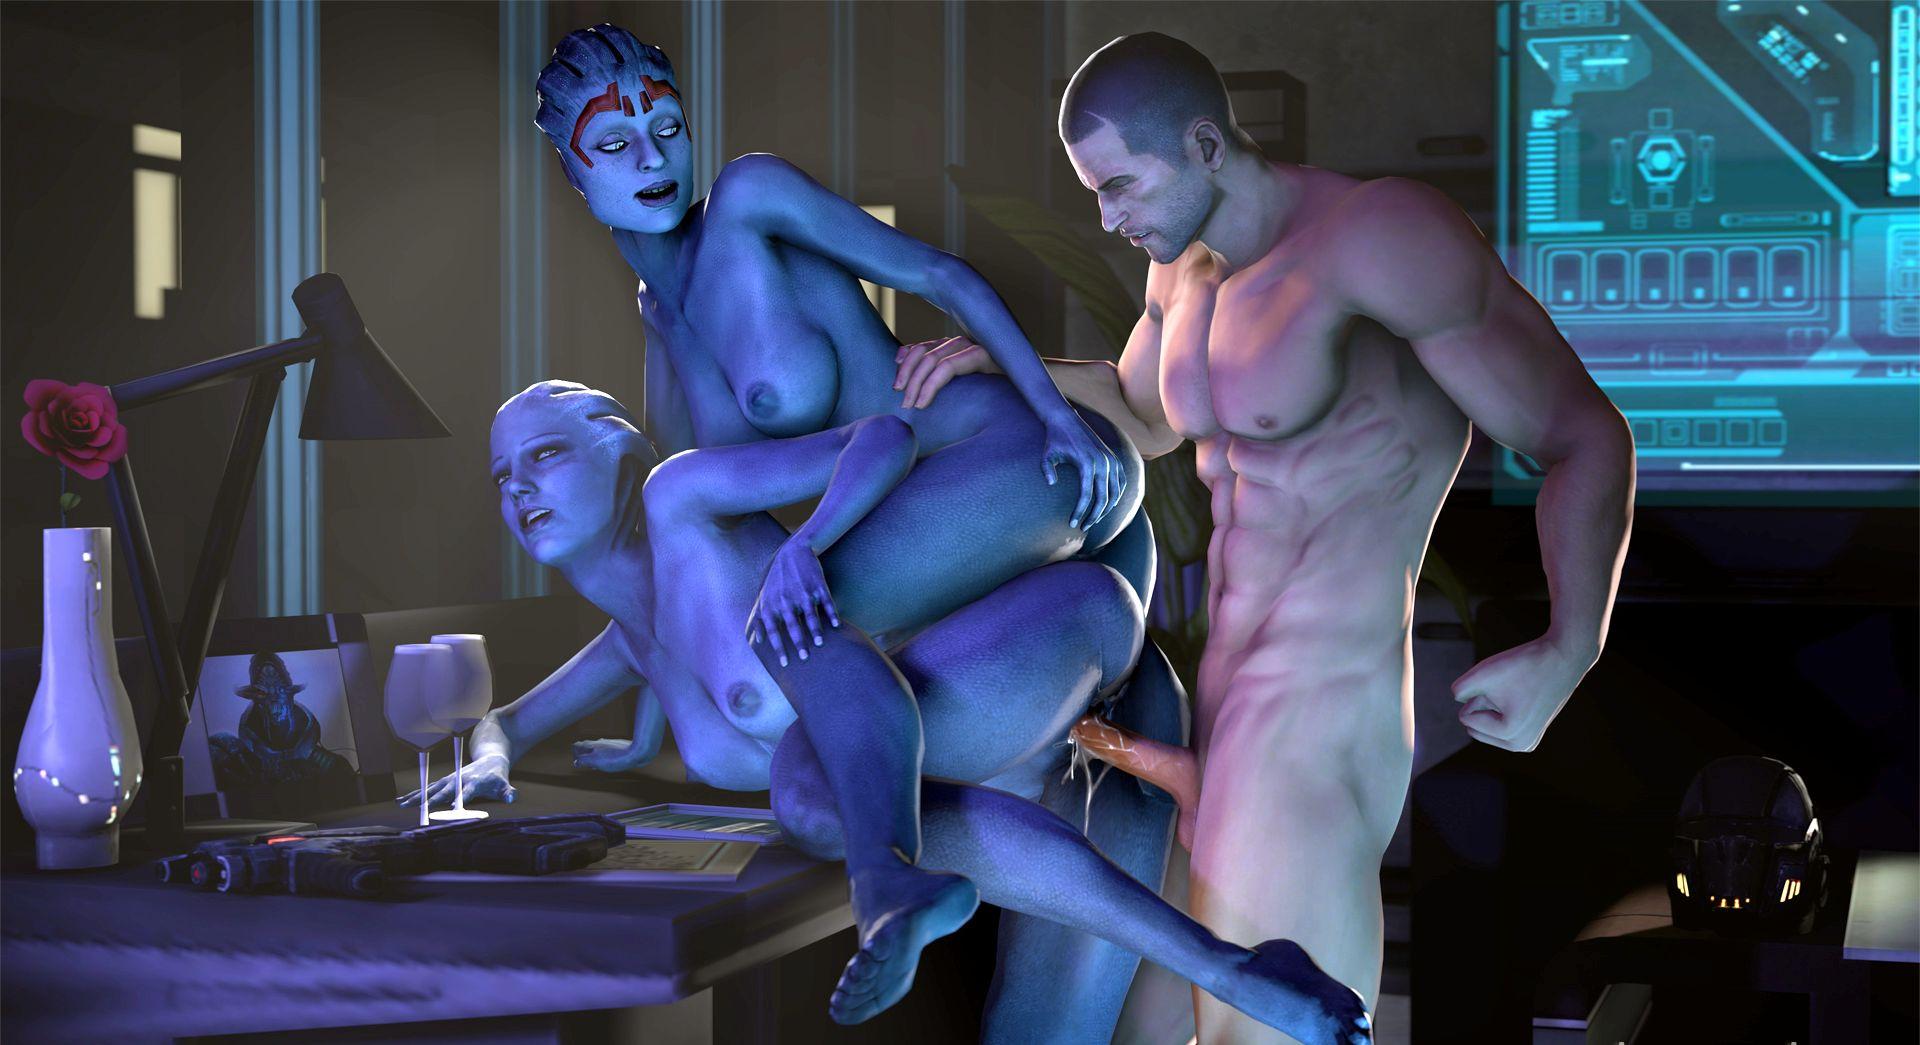 mass-effect-seks-s-samaroy